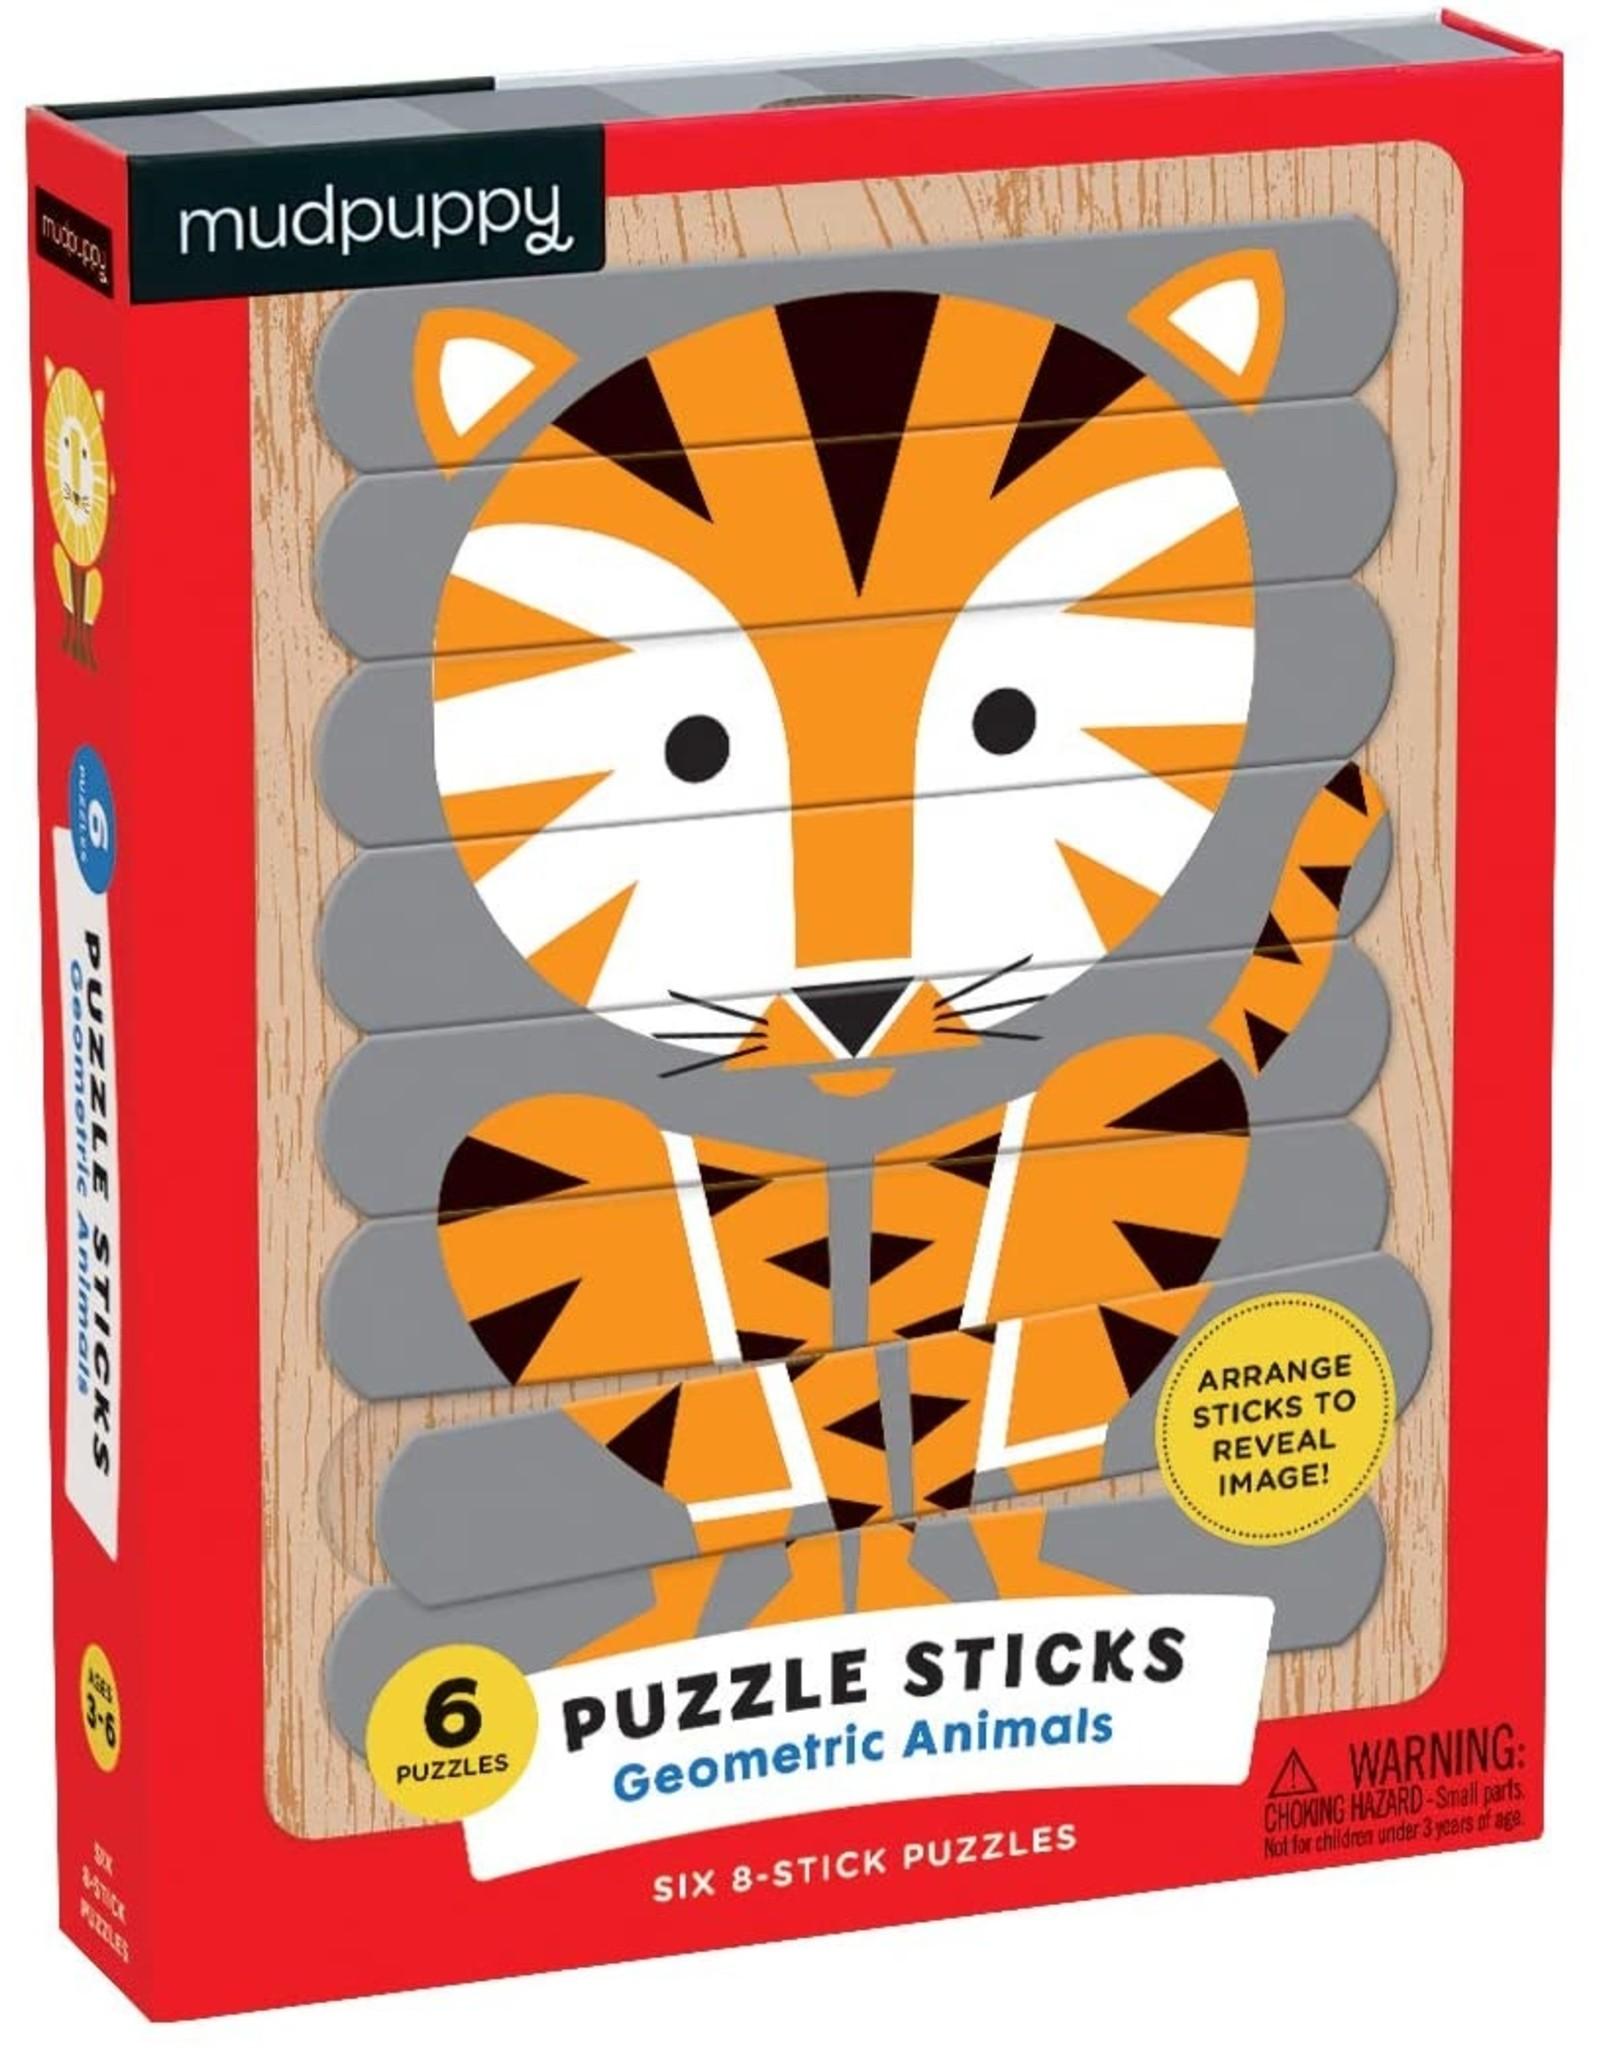 Mudpuppy Puzzle Sticks